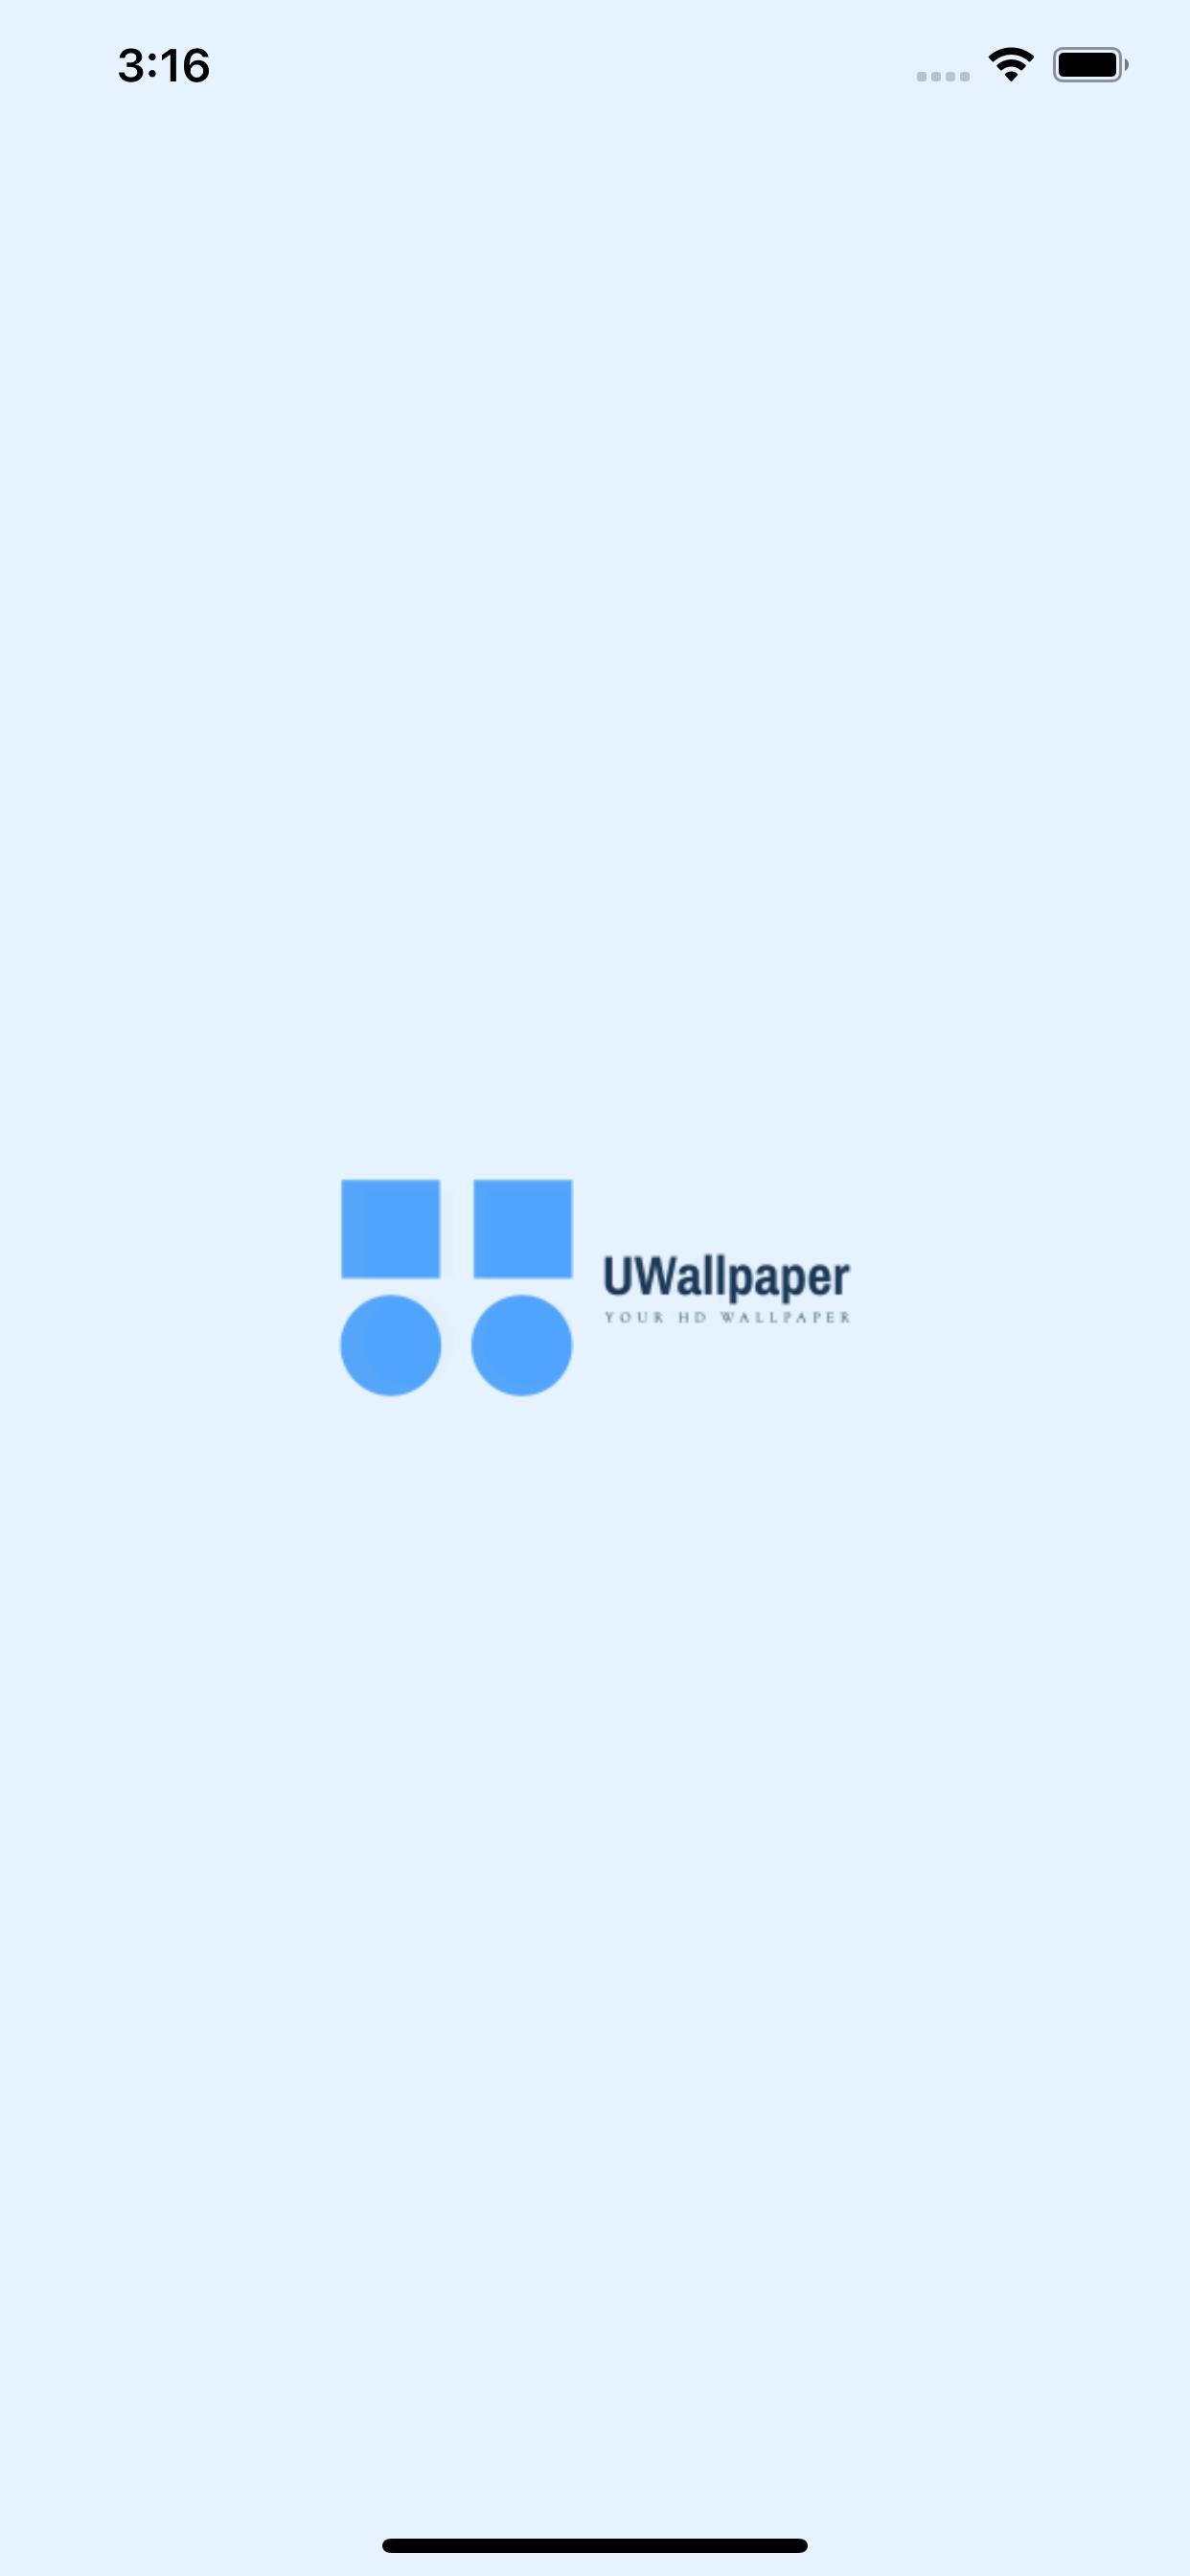 UWallpaper - Your HD Wallpaper Flutter Apps